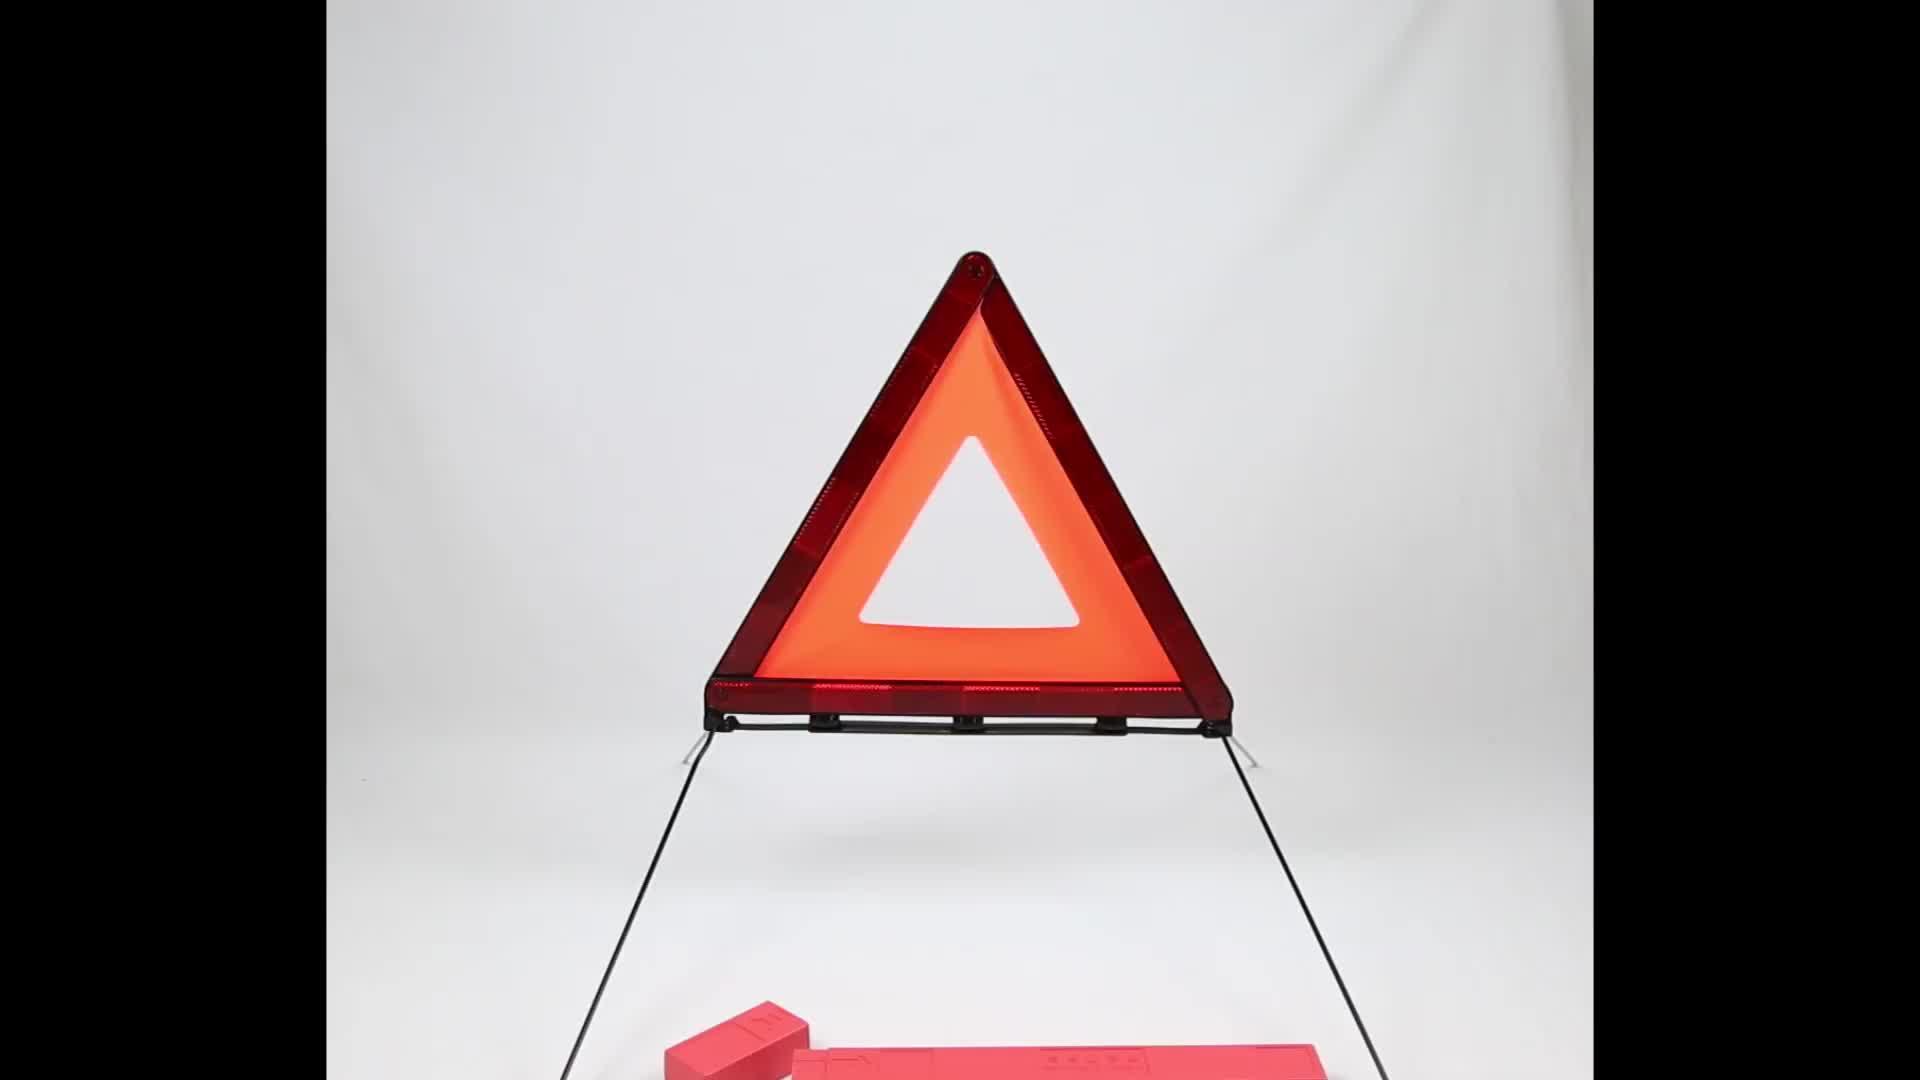 ECE R27 Hotsale Slow Moving Emergency Reflector Board Reflective Dot Car Vehicle Traffic Sign Safety Warning Triangle